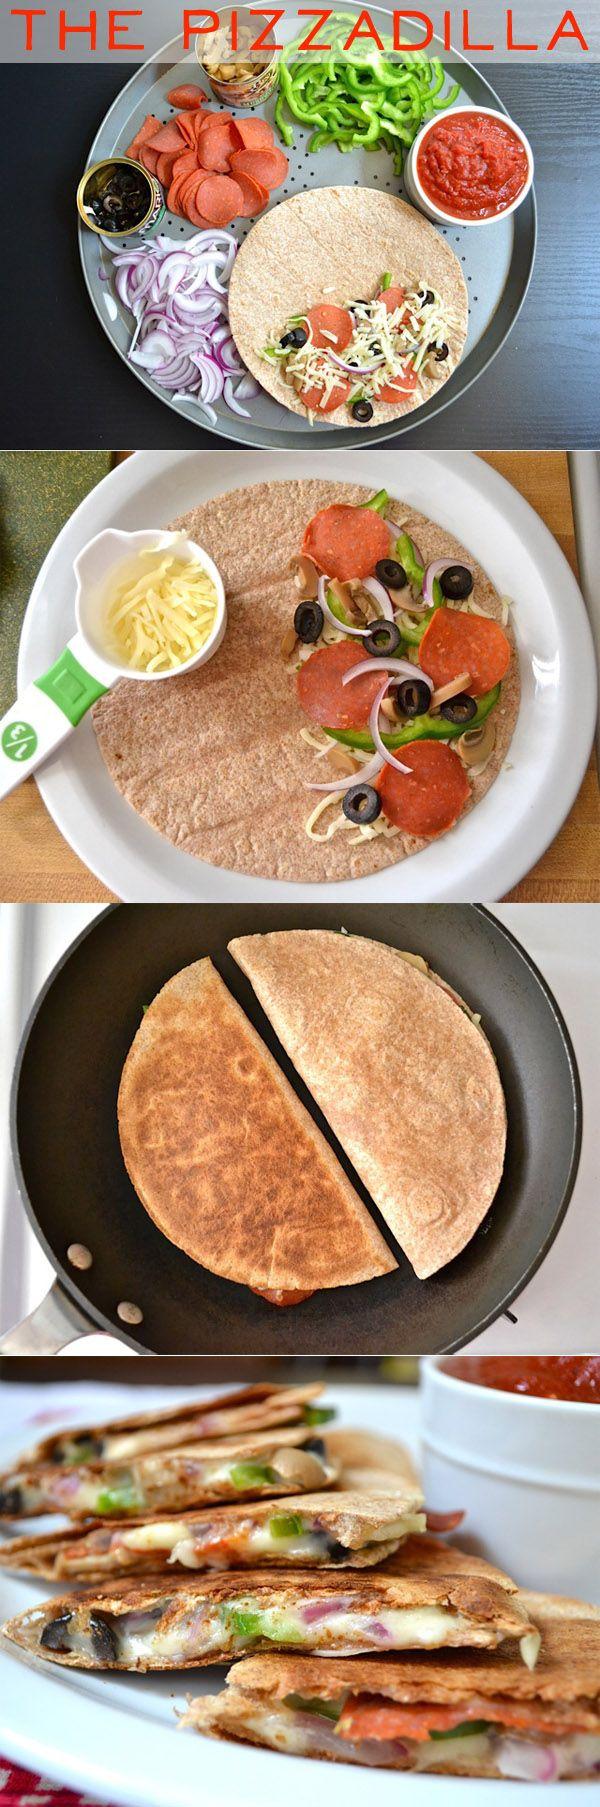 The Pizzadilla via Buzzfeed. Great lunch option!